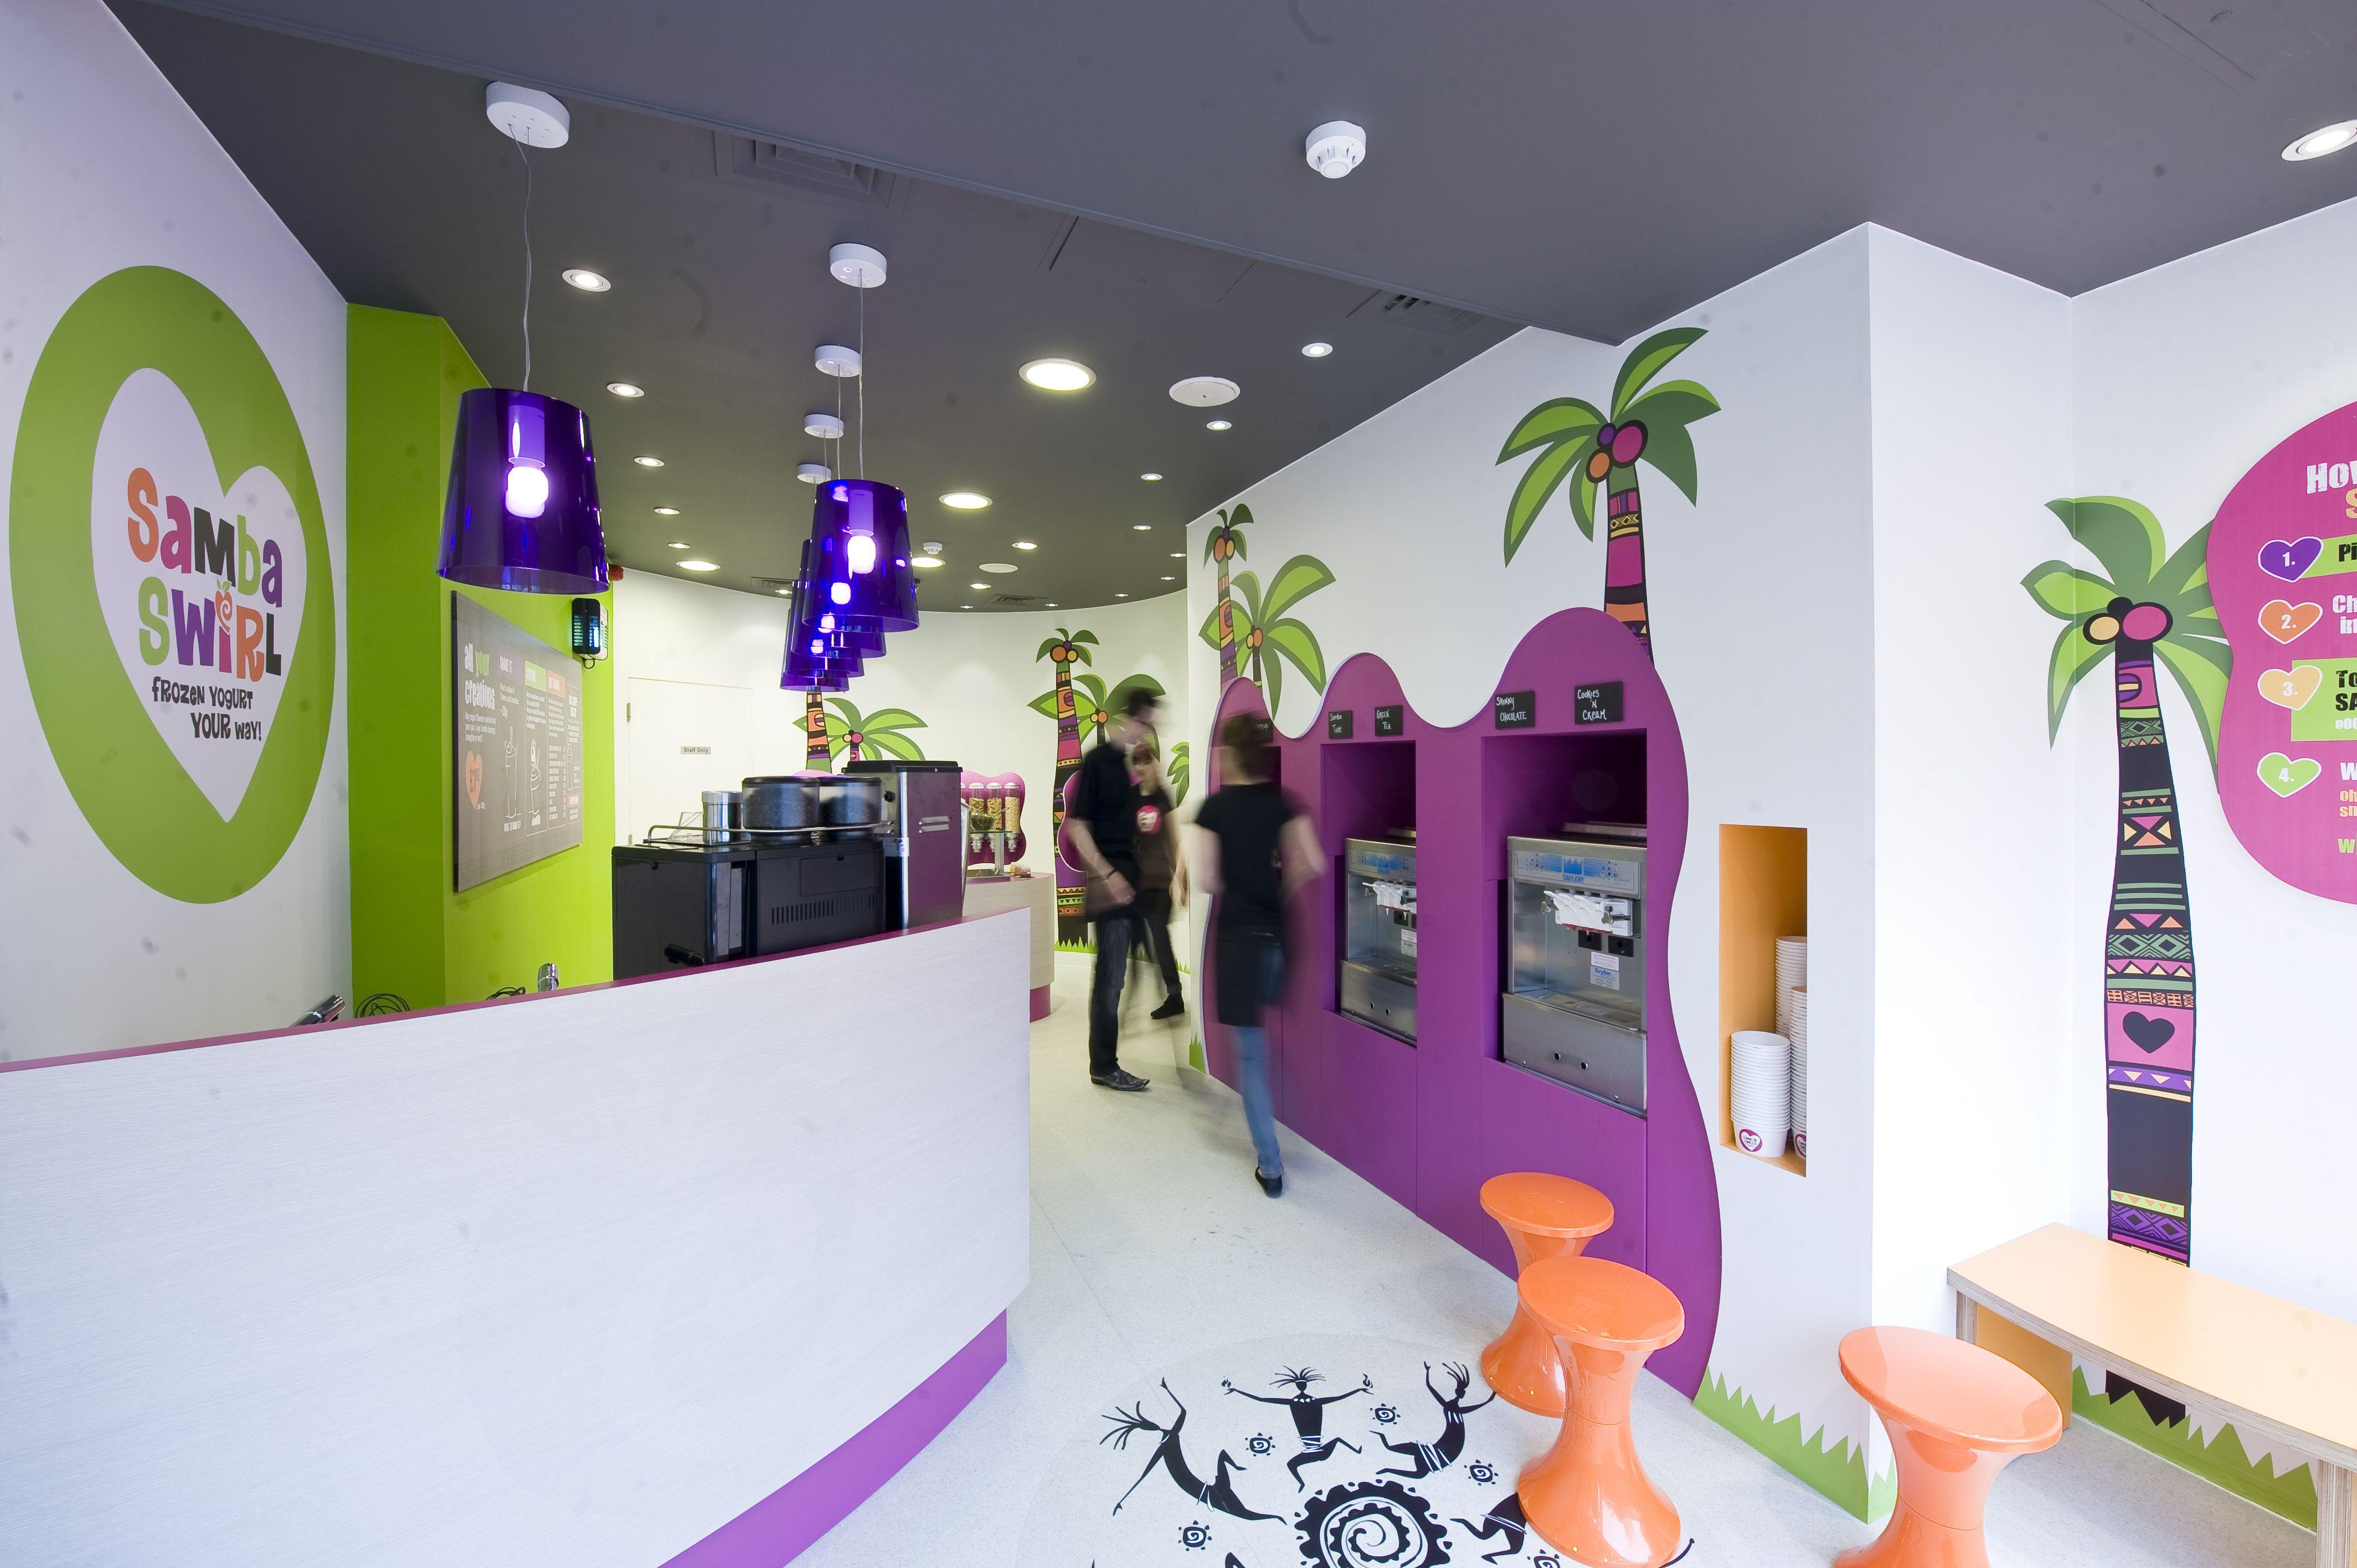 Samba Swirl Frozen Yogurt Shop In Clapham By ABDA Creative Design Build Catering